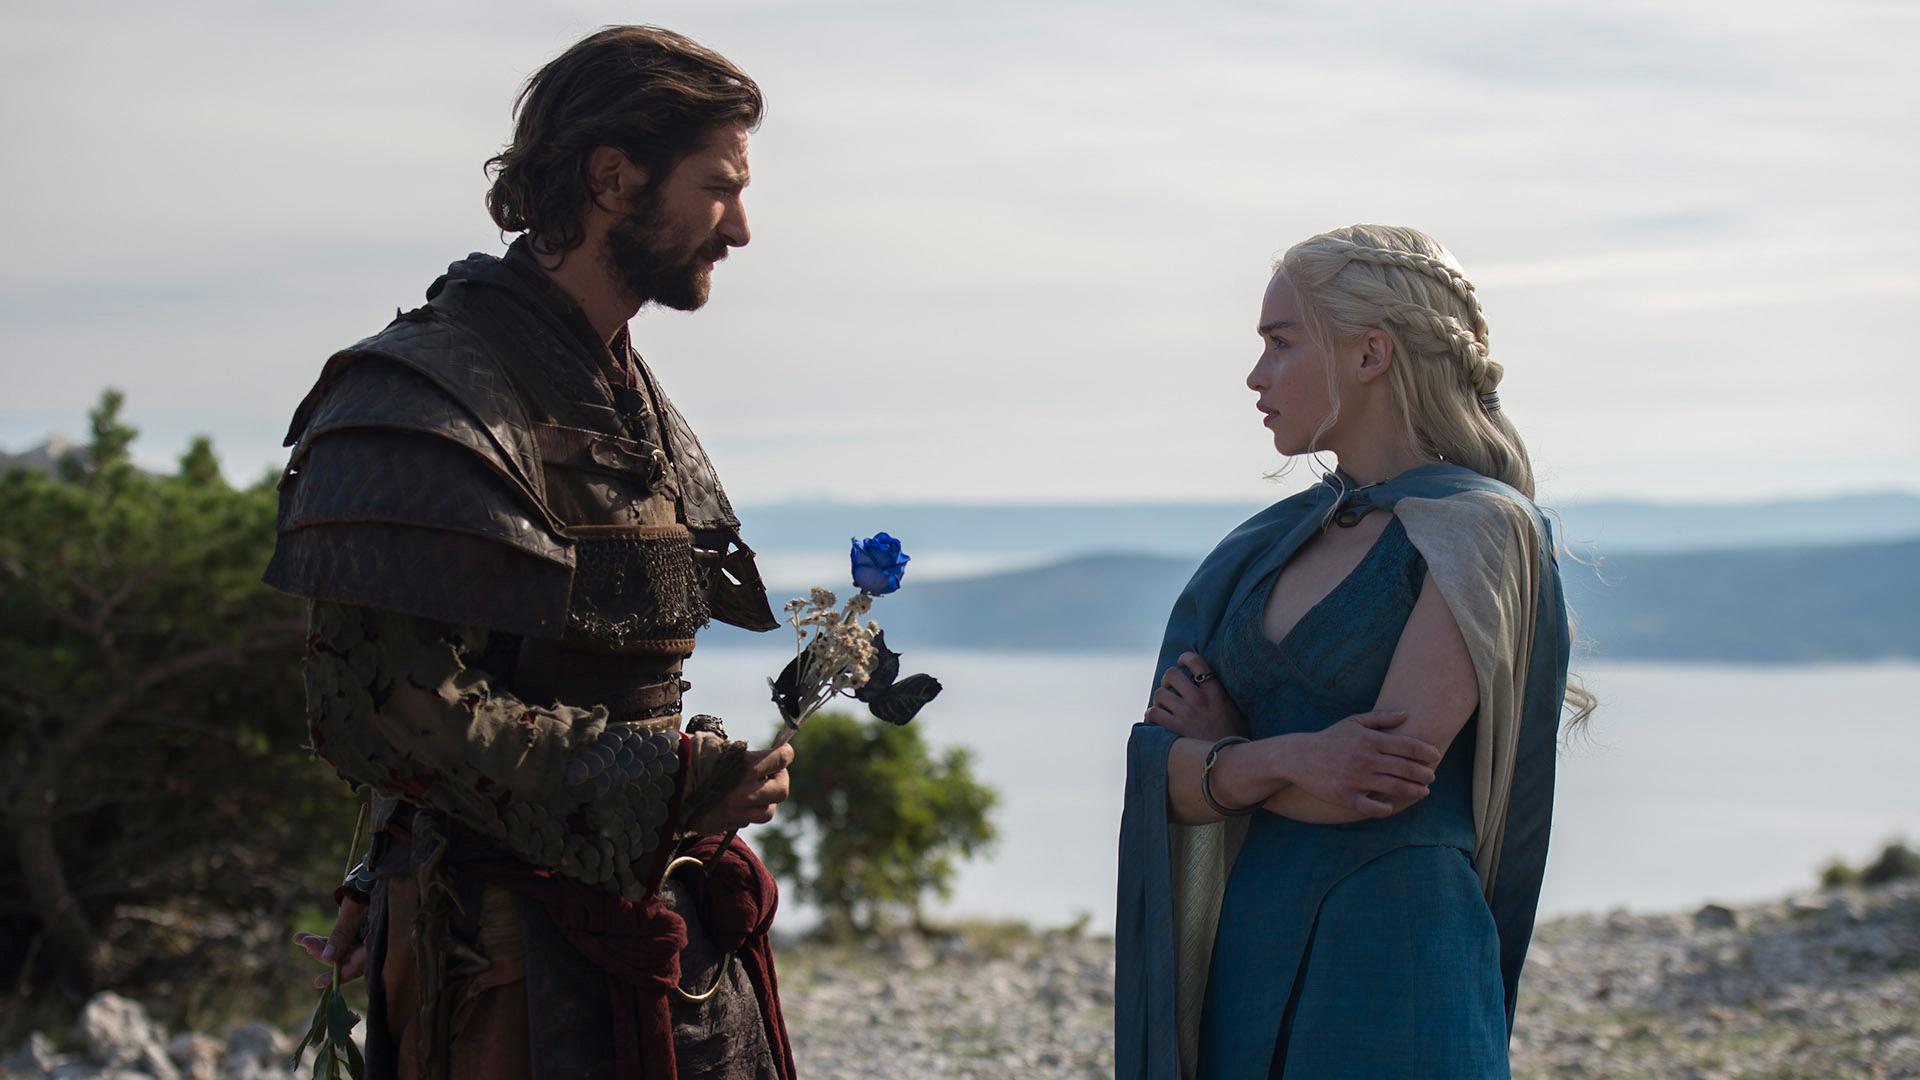 daenerys and daario - Daenerys Targaryen Photo (37001582 ... Daario Naharis And Daenerys